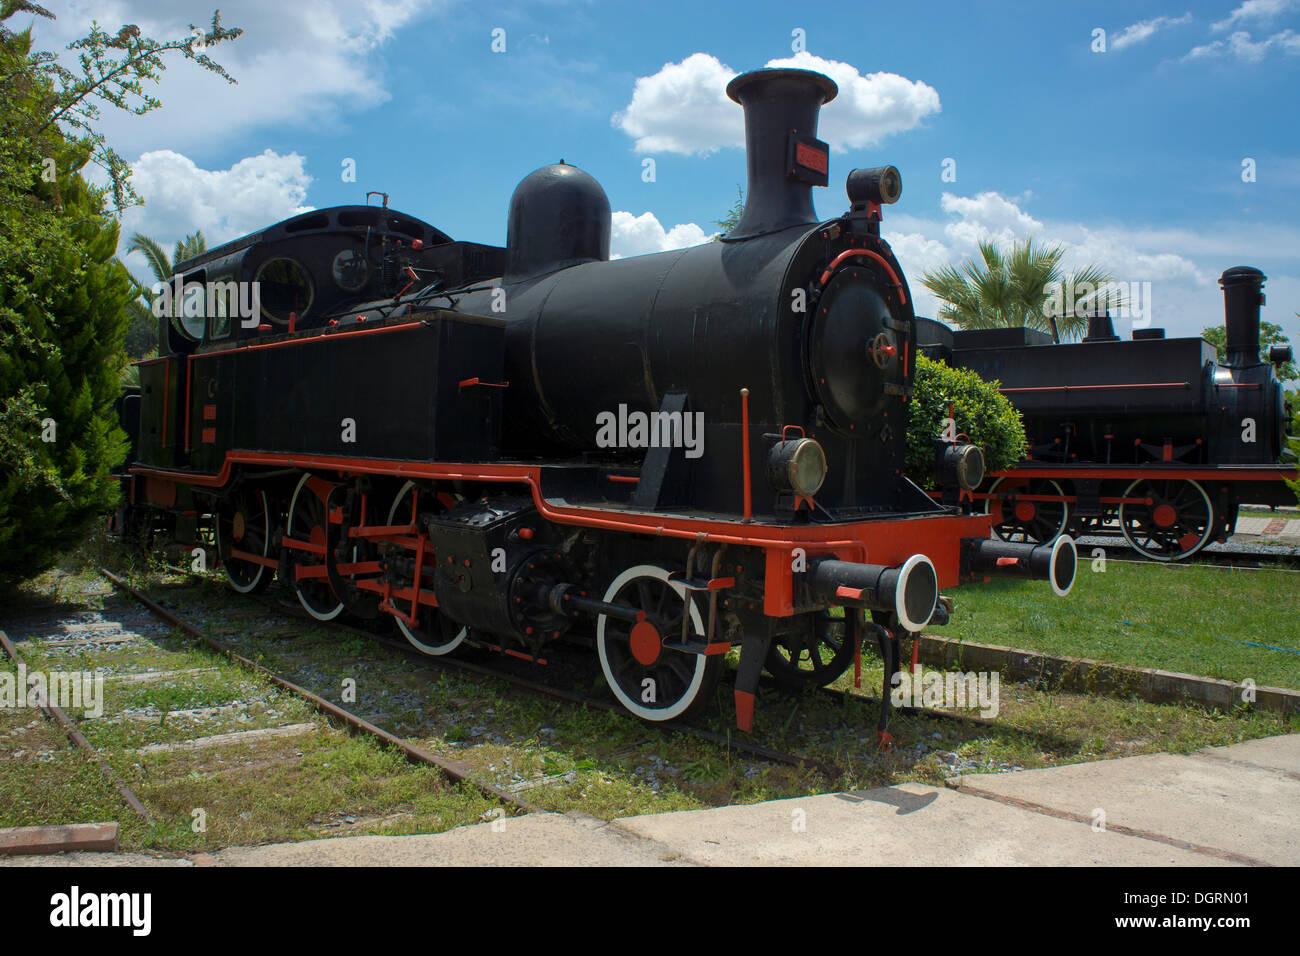 3405 locomotive, by Borsig, built between 1905 and 1909, Çamlik Railway Museum, Çamlik, Turkey, Asia - Stock Image